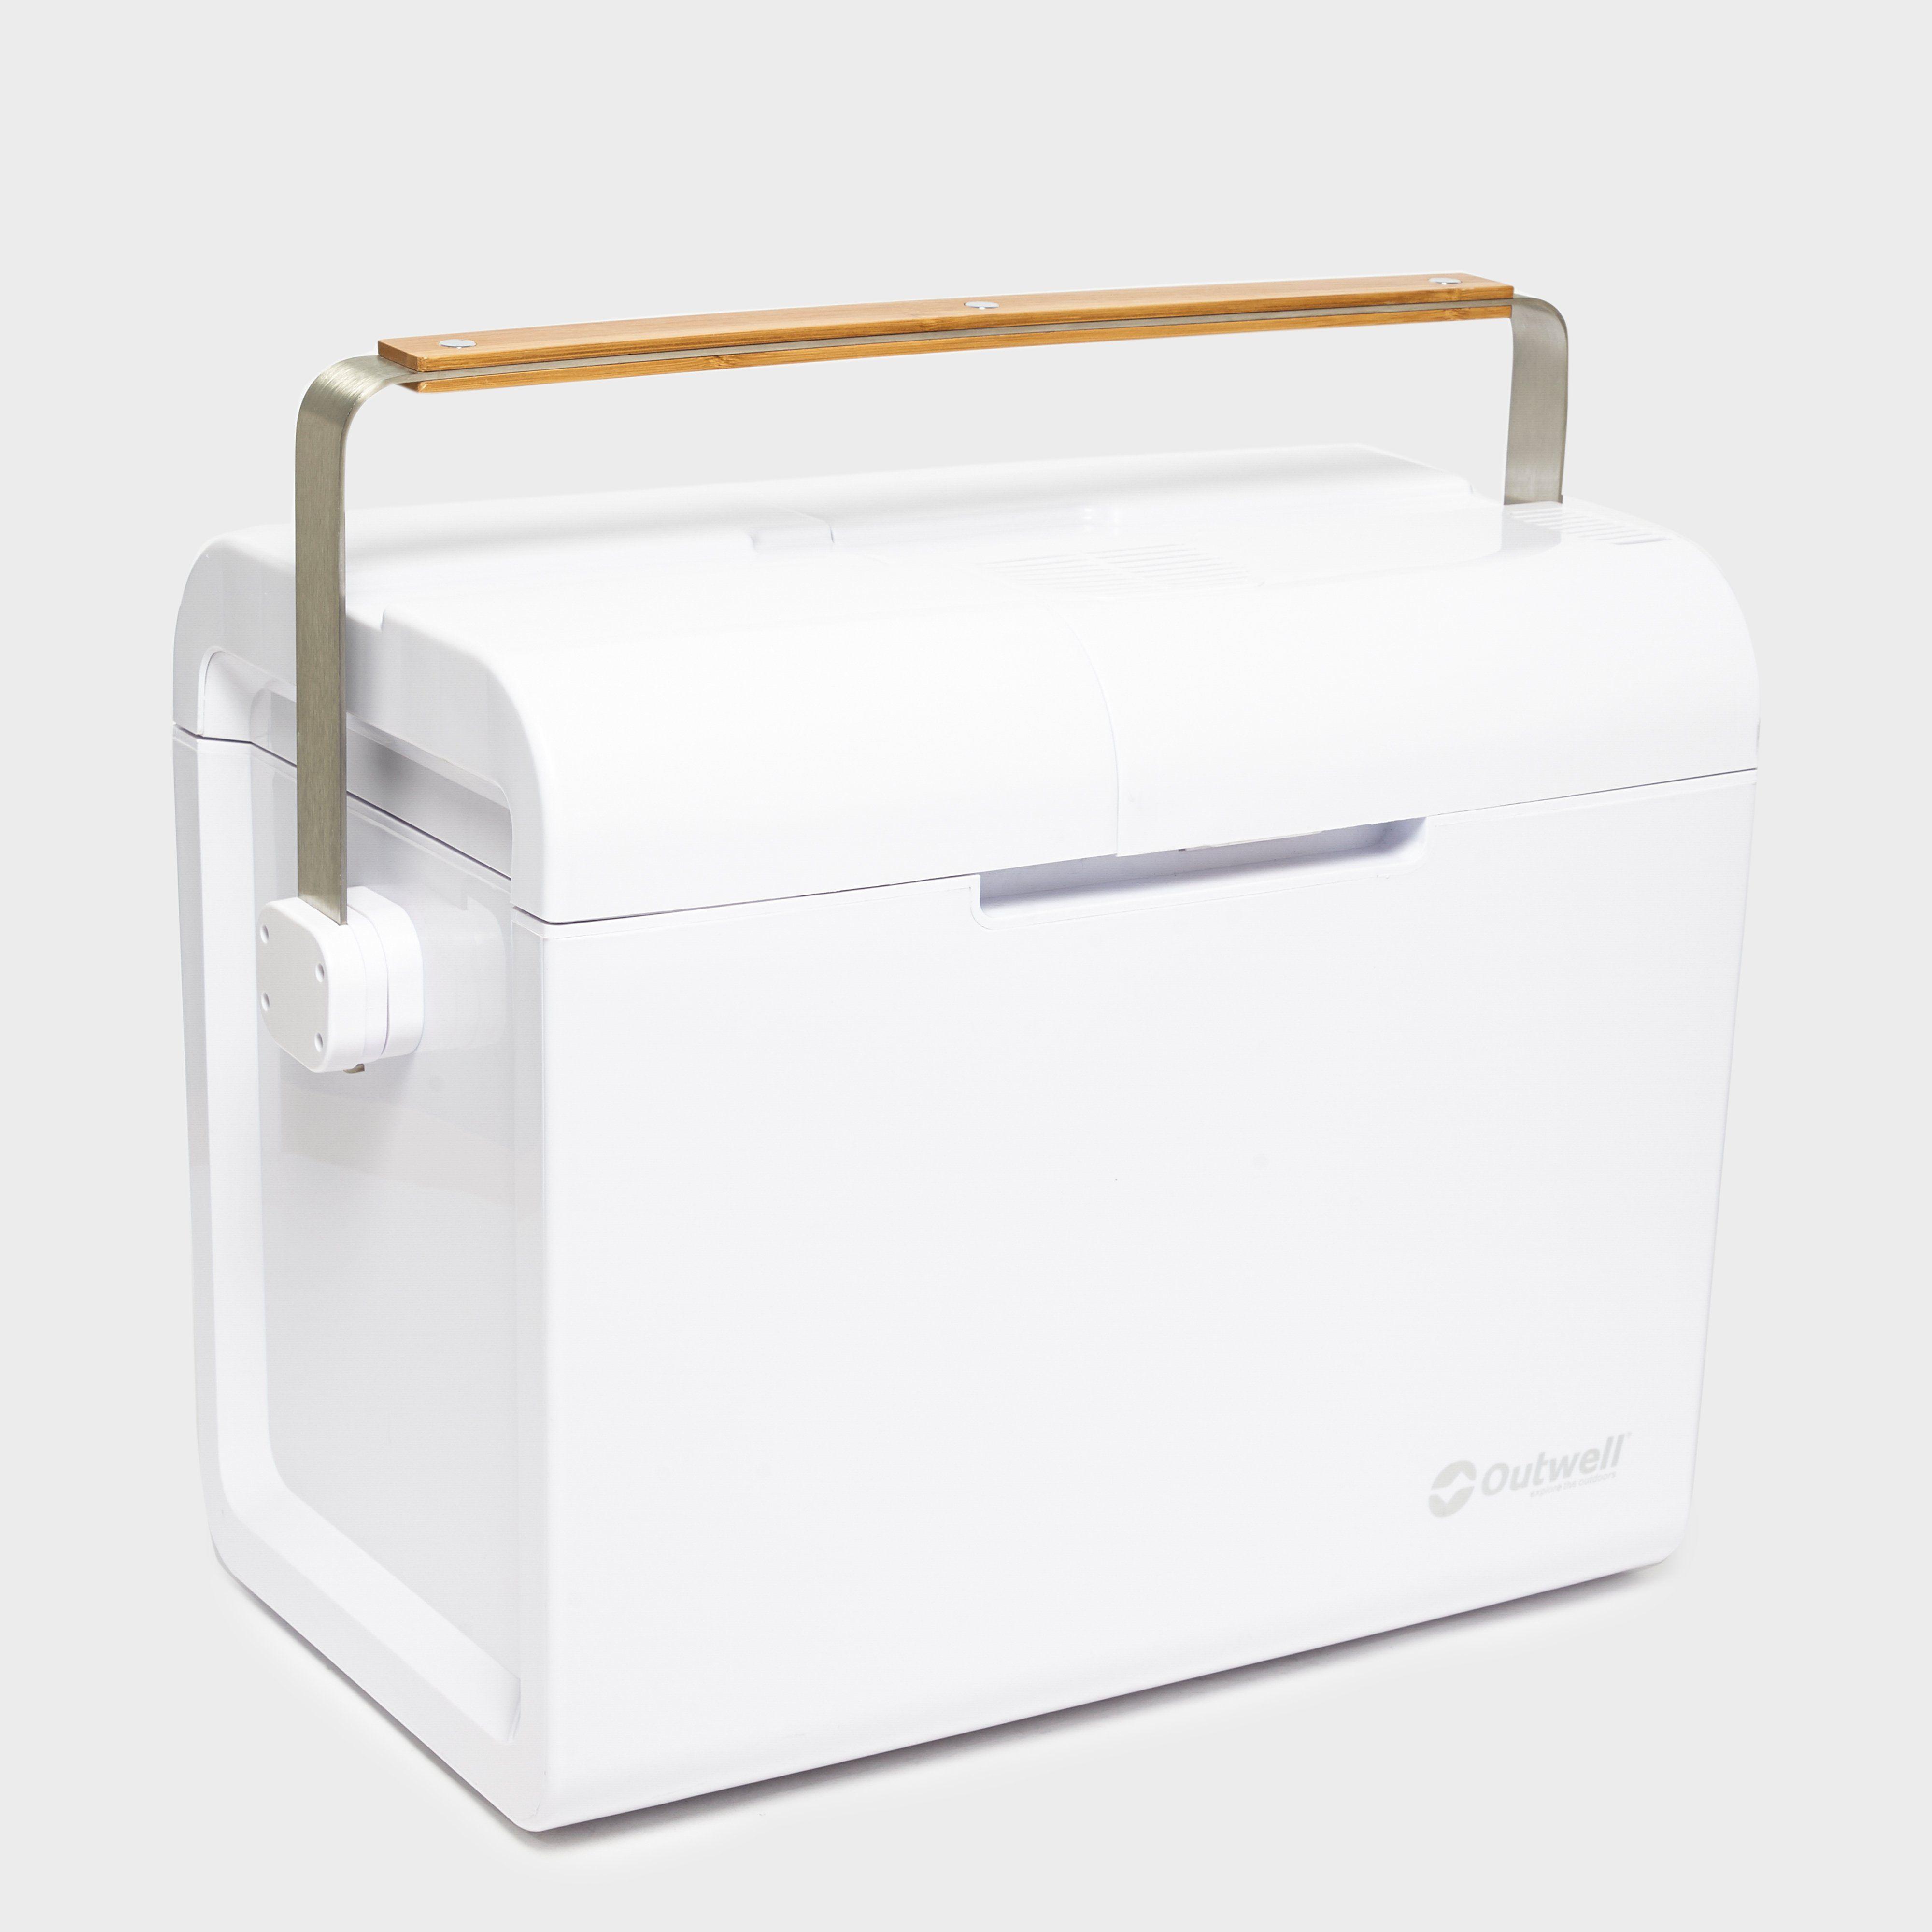 OUTWELL ECOlux 35L 12v/230v Cool Box